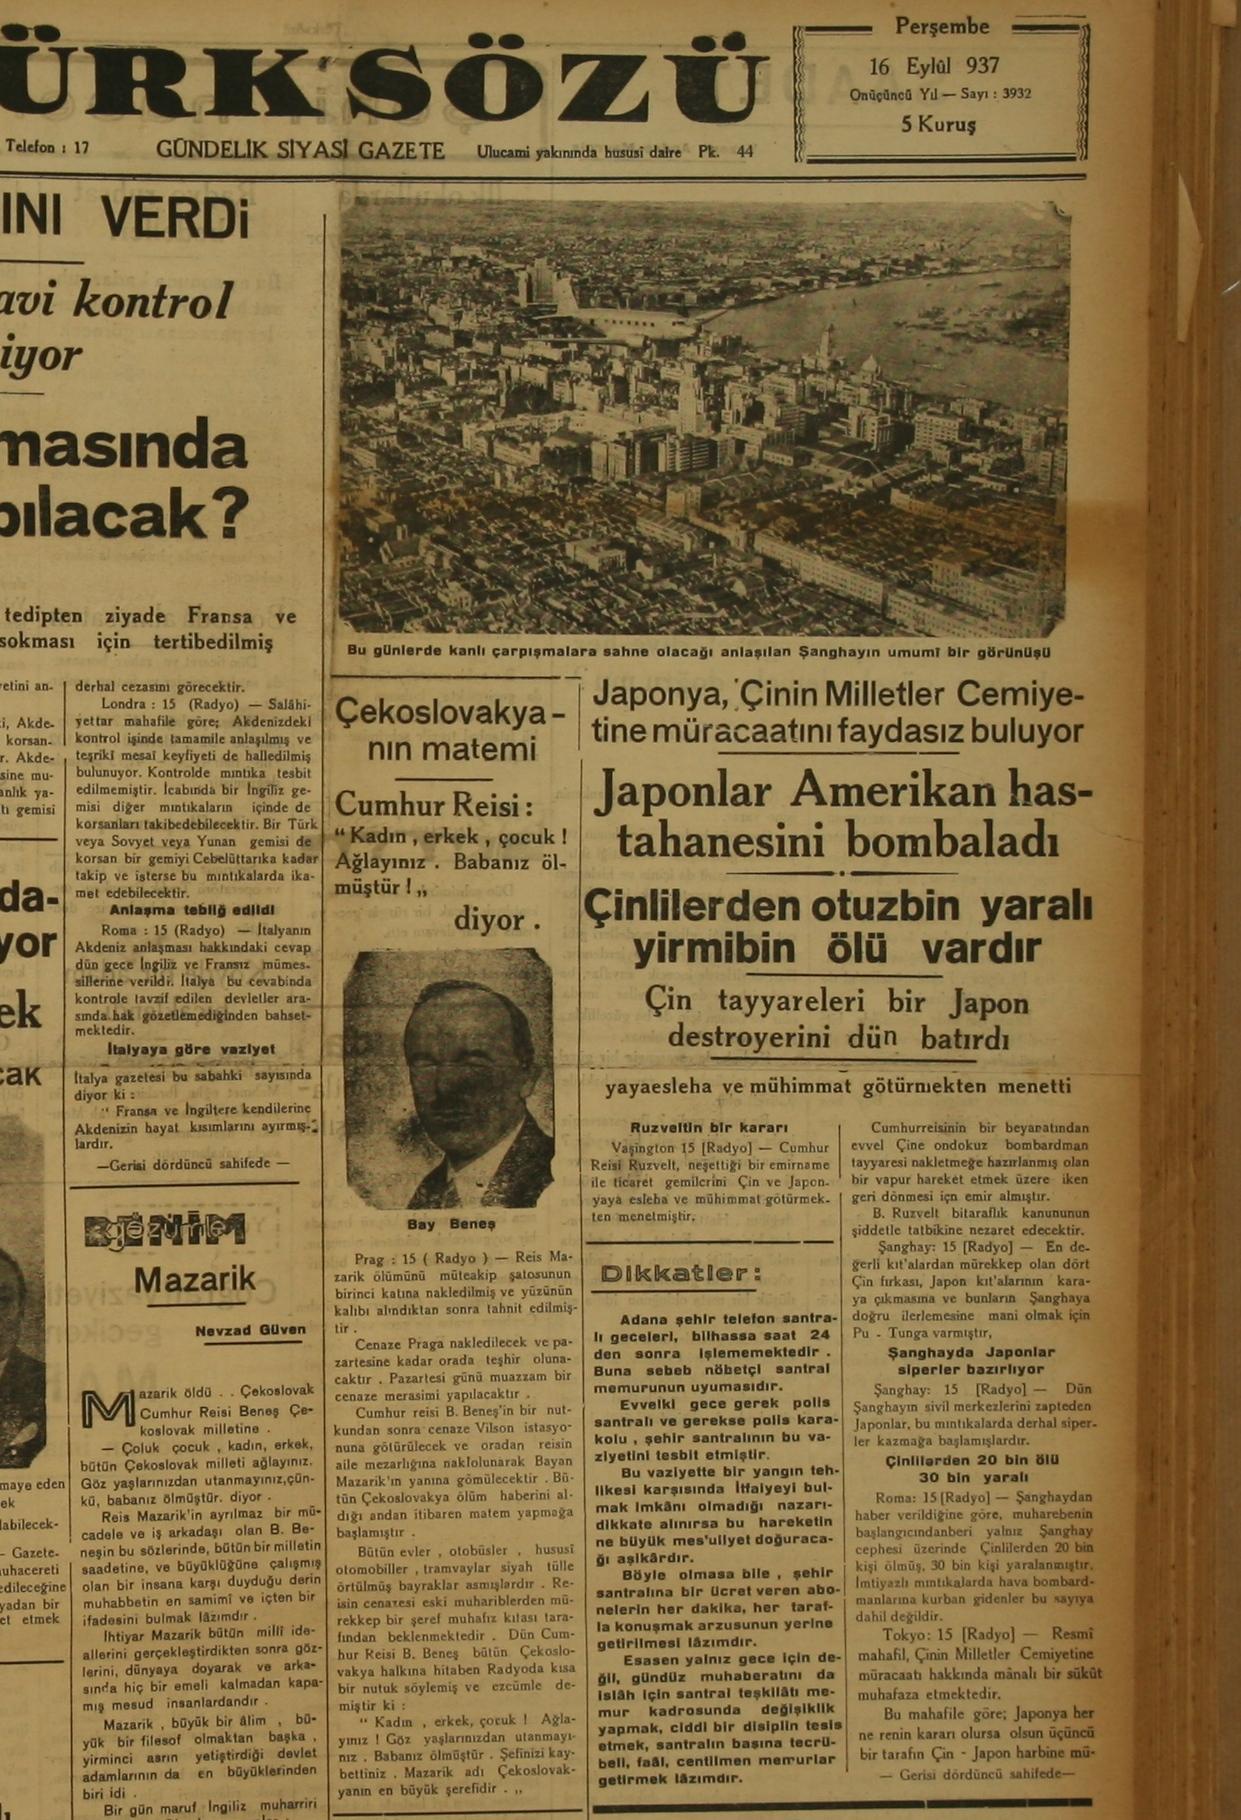 1937-09-16-turksozu-gazetesi-img-5114-1.JPG